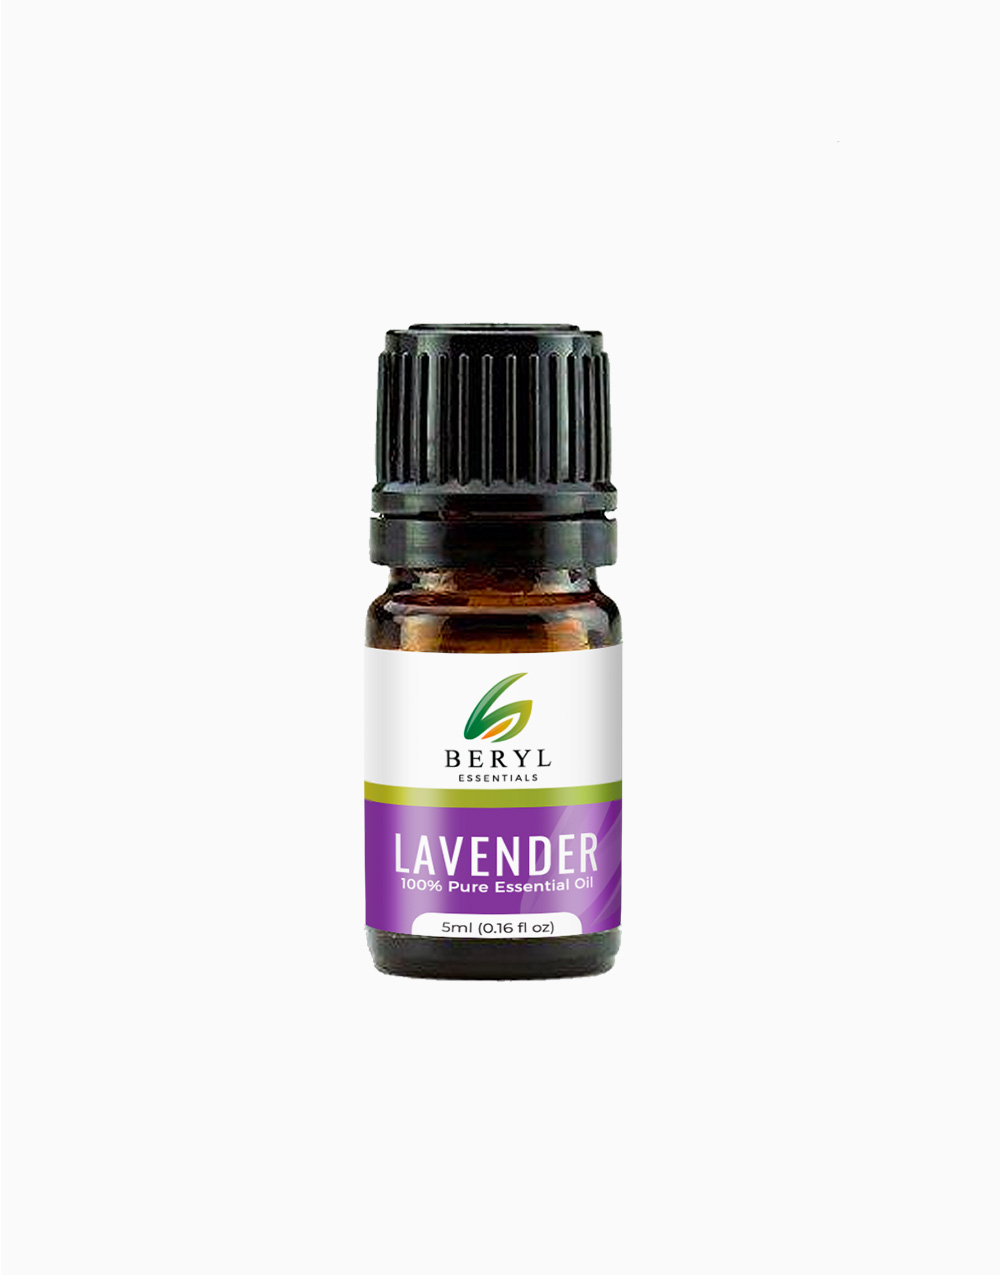 Lavender Essential Oil (5ml) by Beryl Essentials